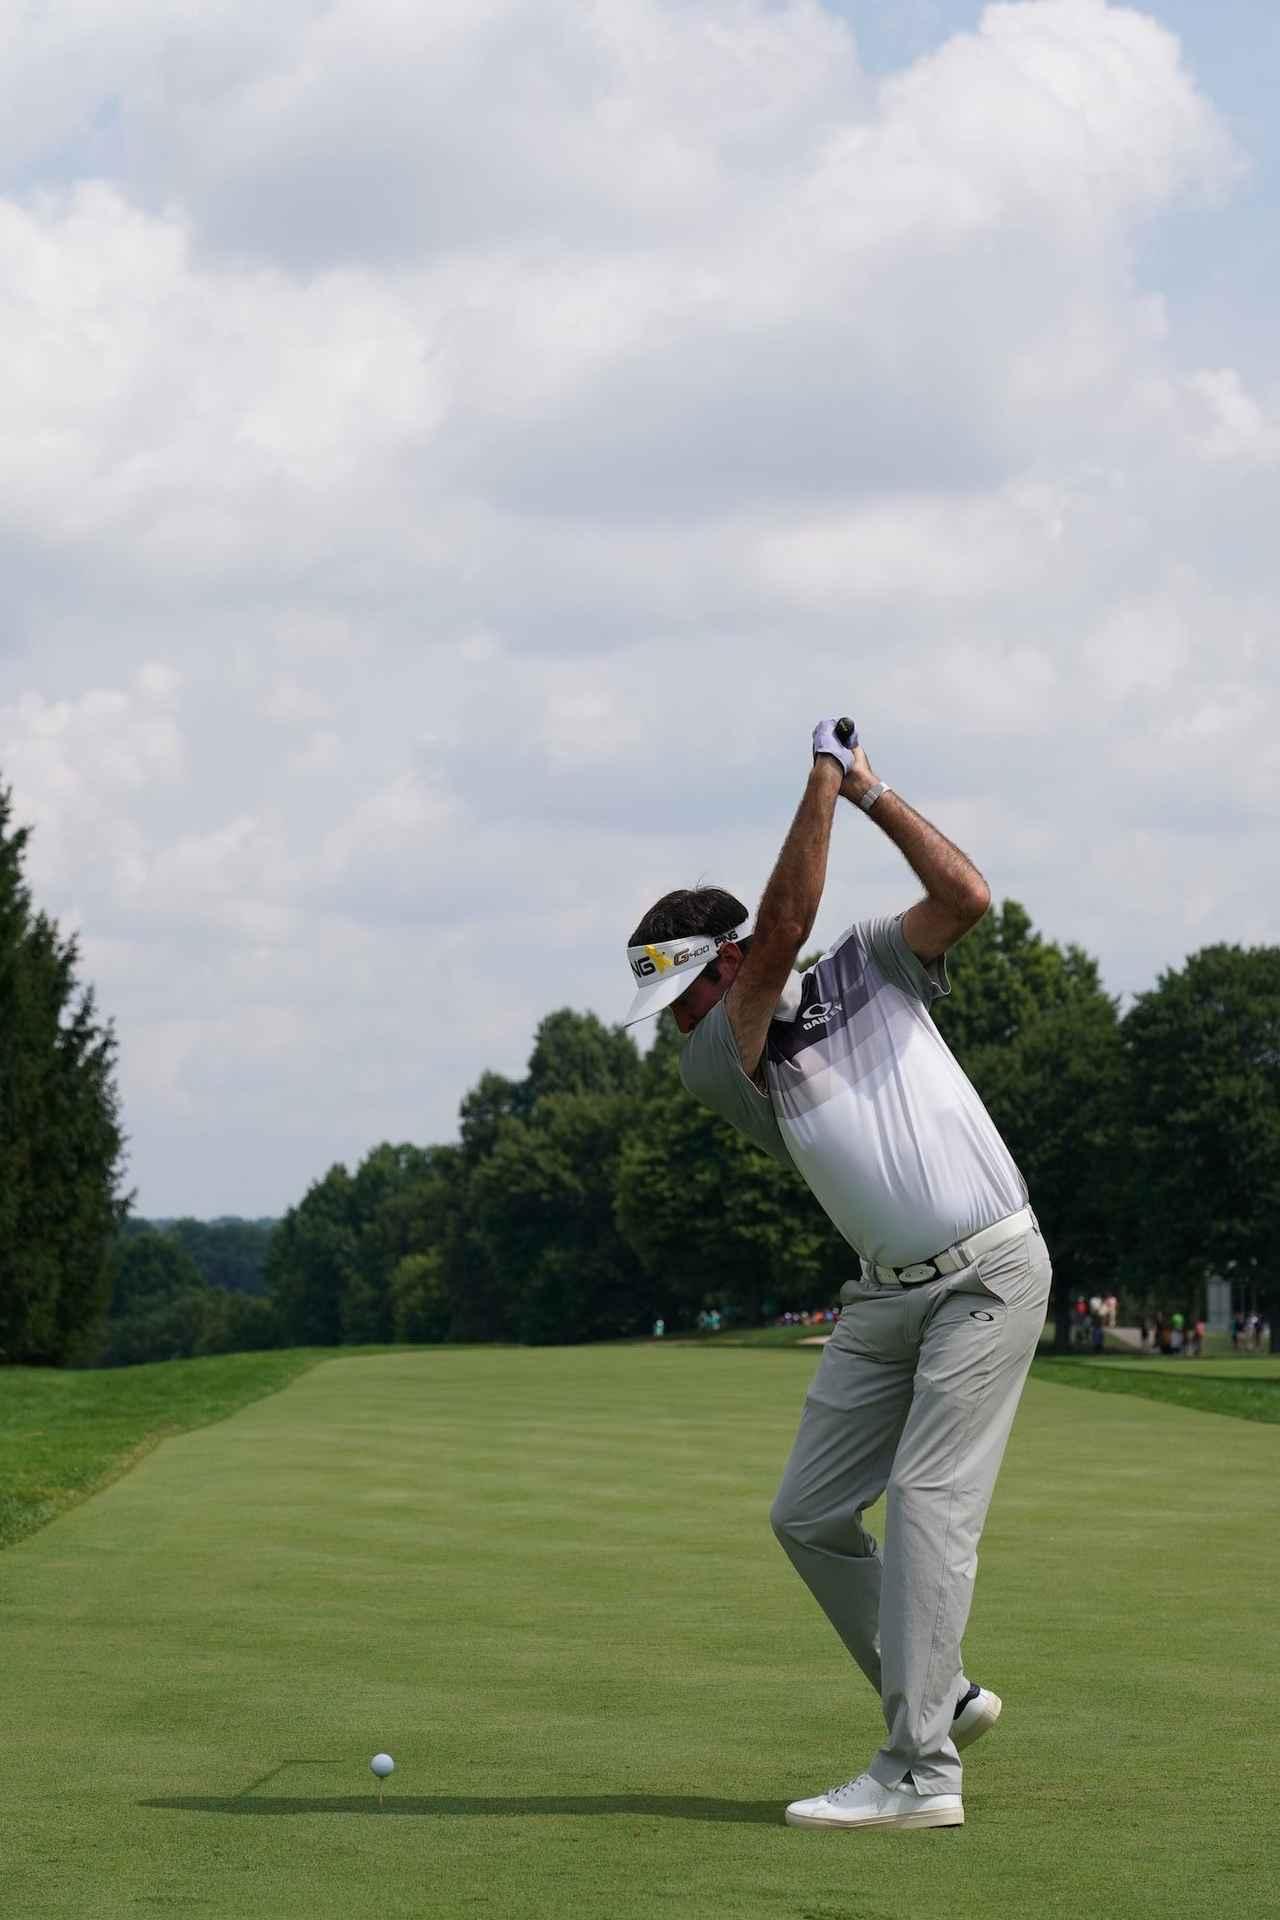 Images : 10番目の画像 - 強烈! バッバ・ワトソンのドライバーショット - みんなのゴルフダイジェスト